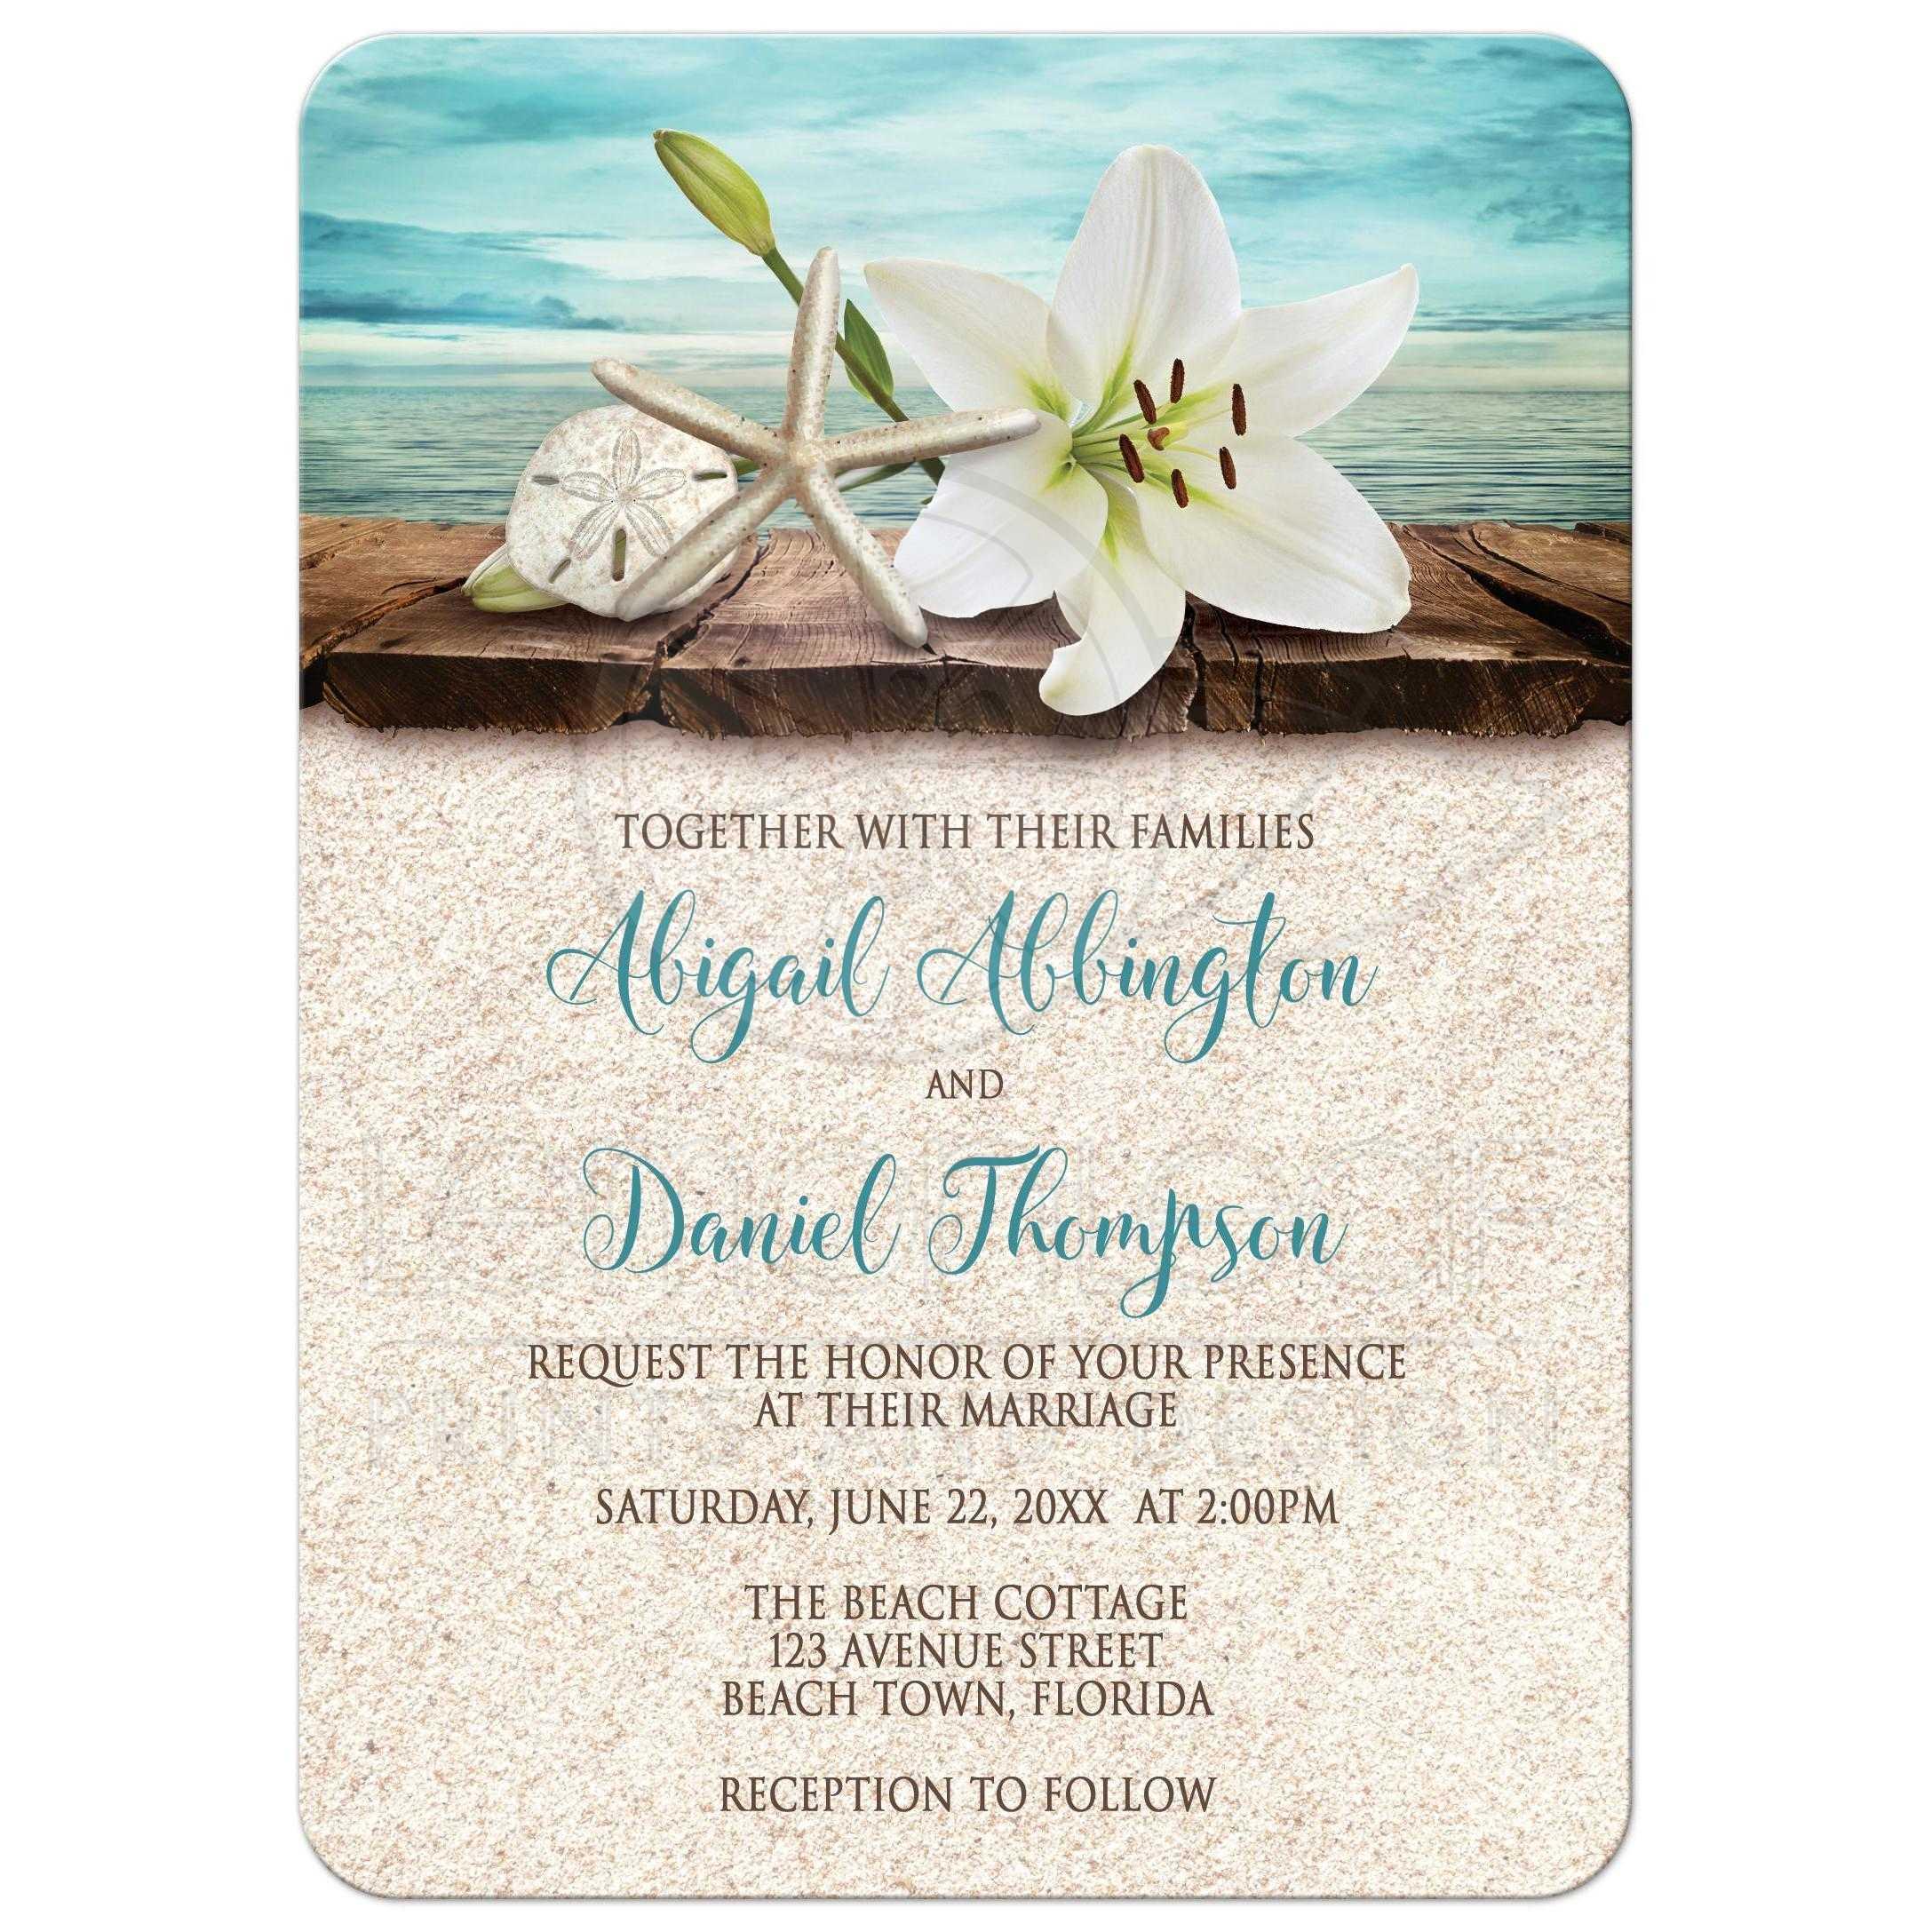 beach wedding invitations with sand beach wedding invitations Invitations Beach Lily Seass And Sand